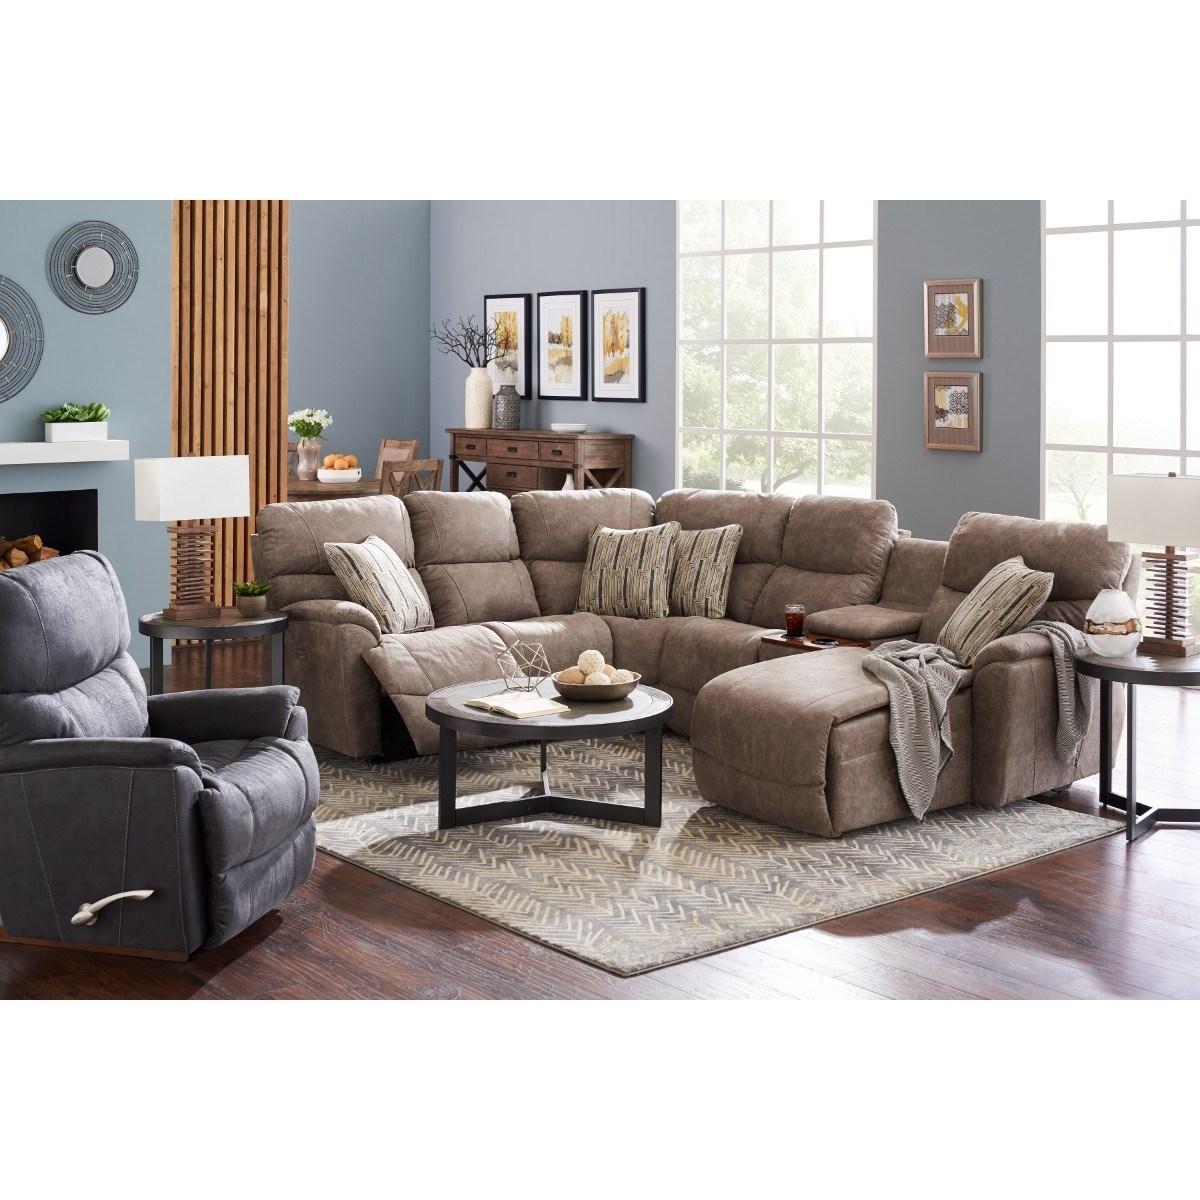 La Z Boy Trouper Five Piece Power Reclining Sofa With Left